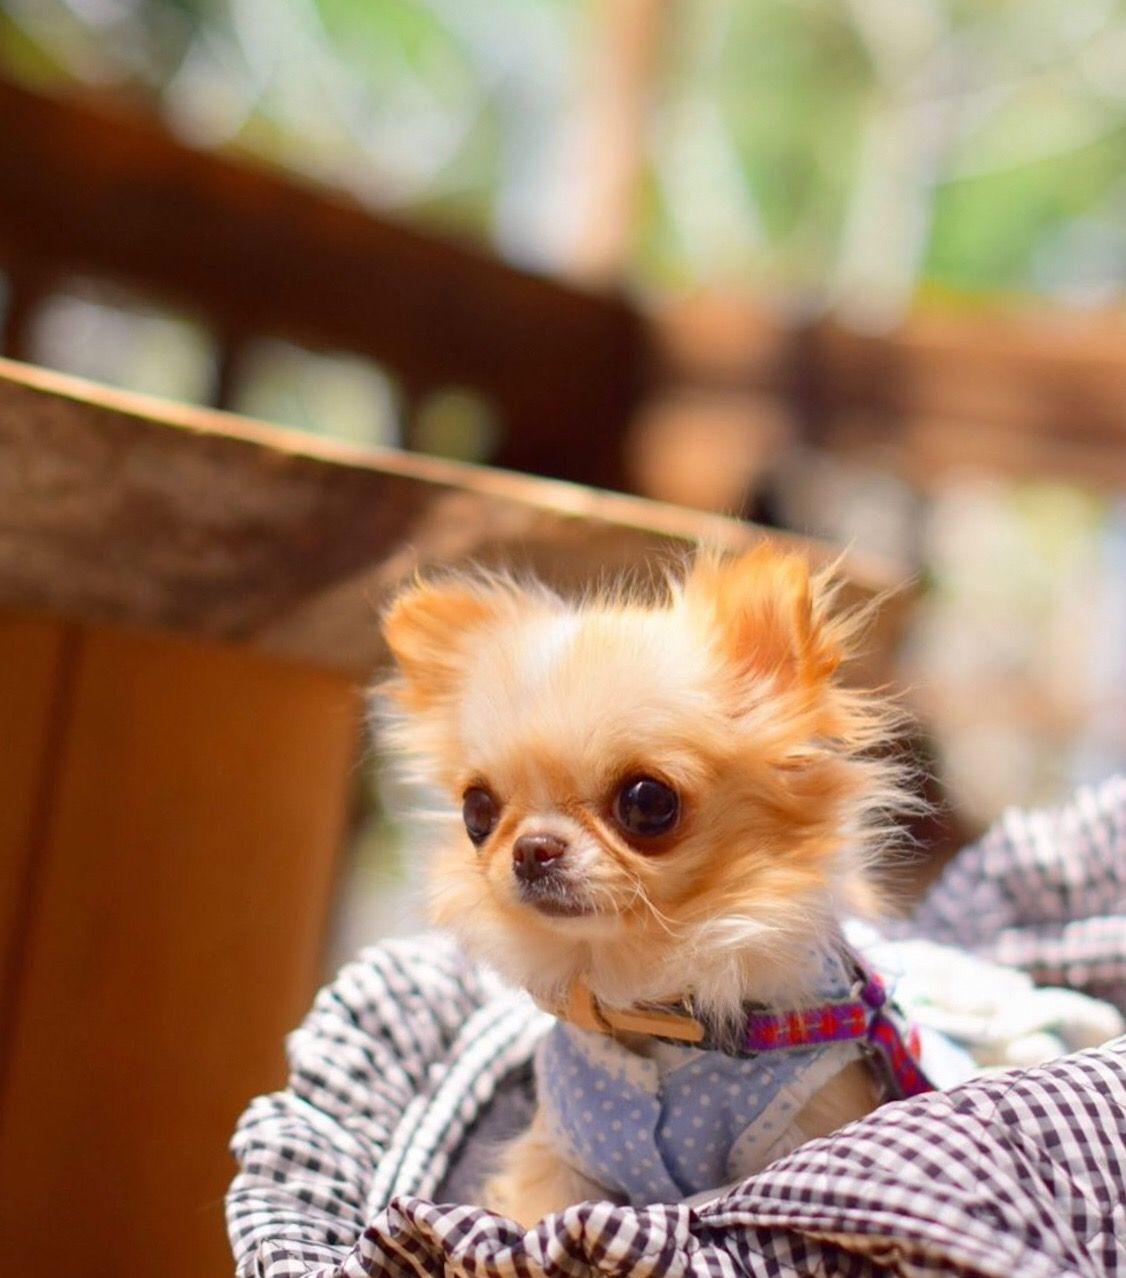 Pin By Chiwawadog On Cute Chihuahua Chihuahua Chihuahua Puppies Cute Chihuahua